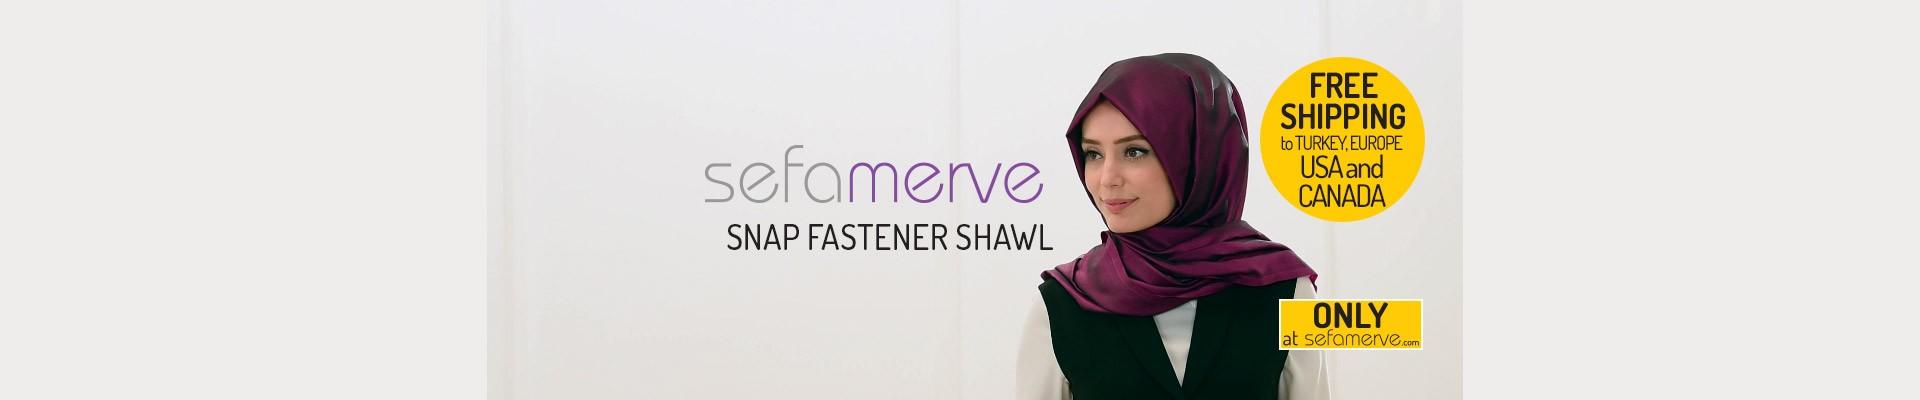 Snap Fastener Shawl